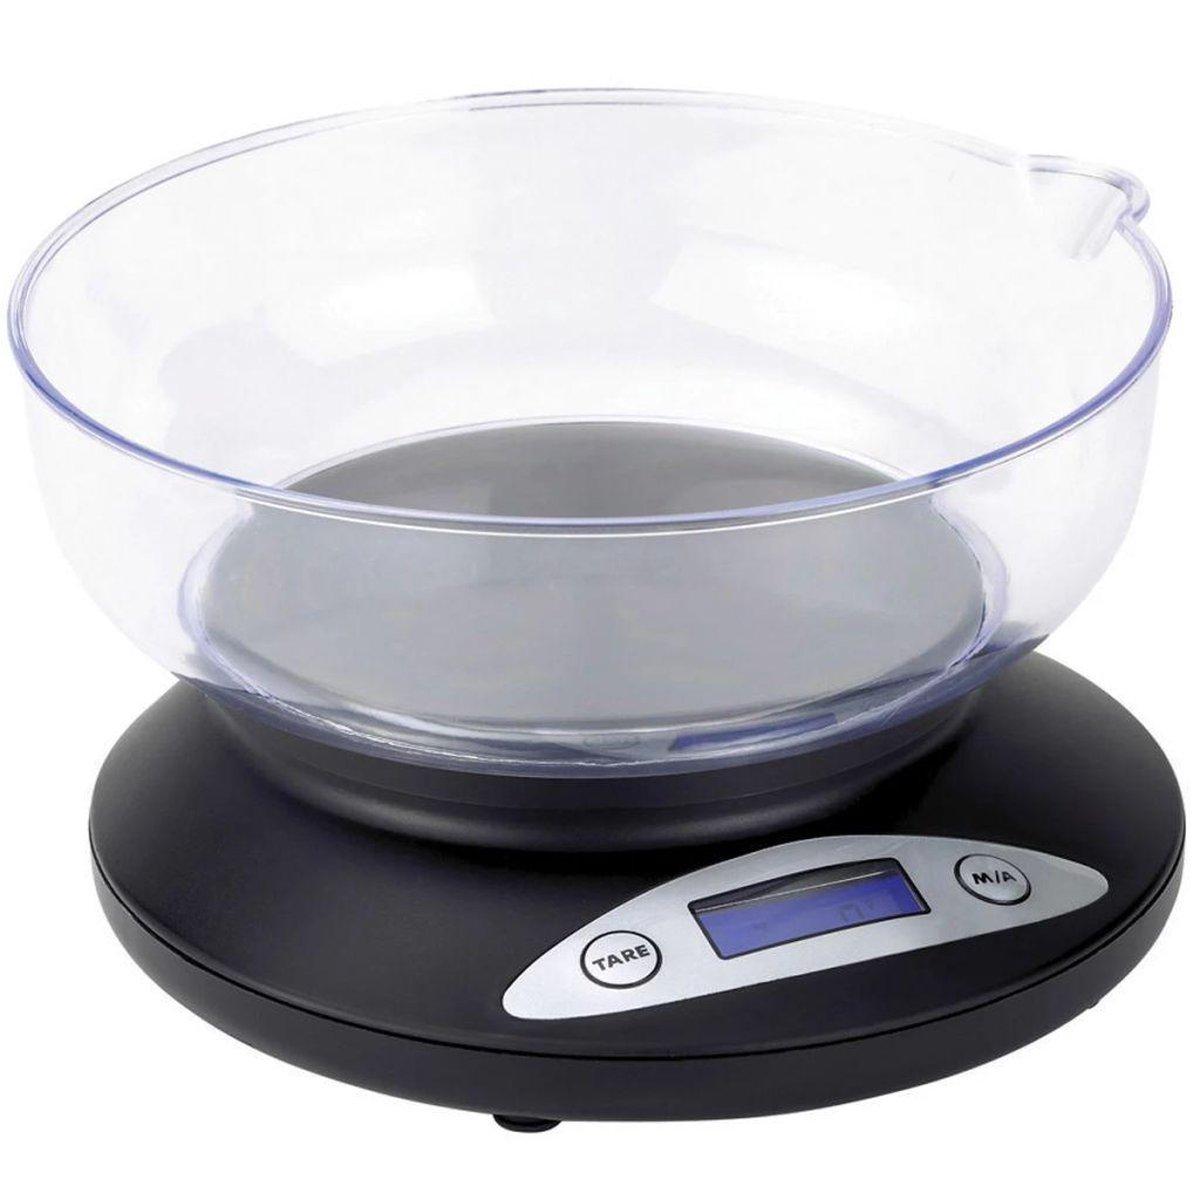 Tristar Keukenweegschaal KW-2430 - Tot 2 kg - Zwart